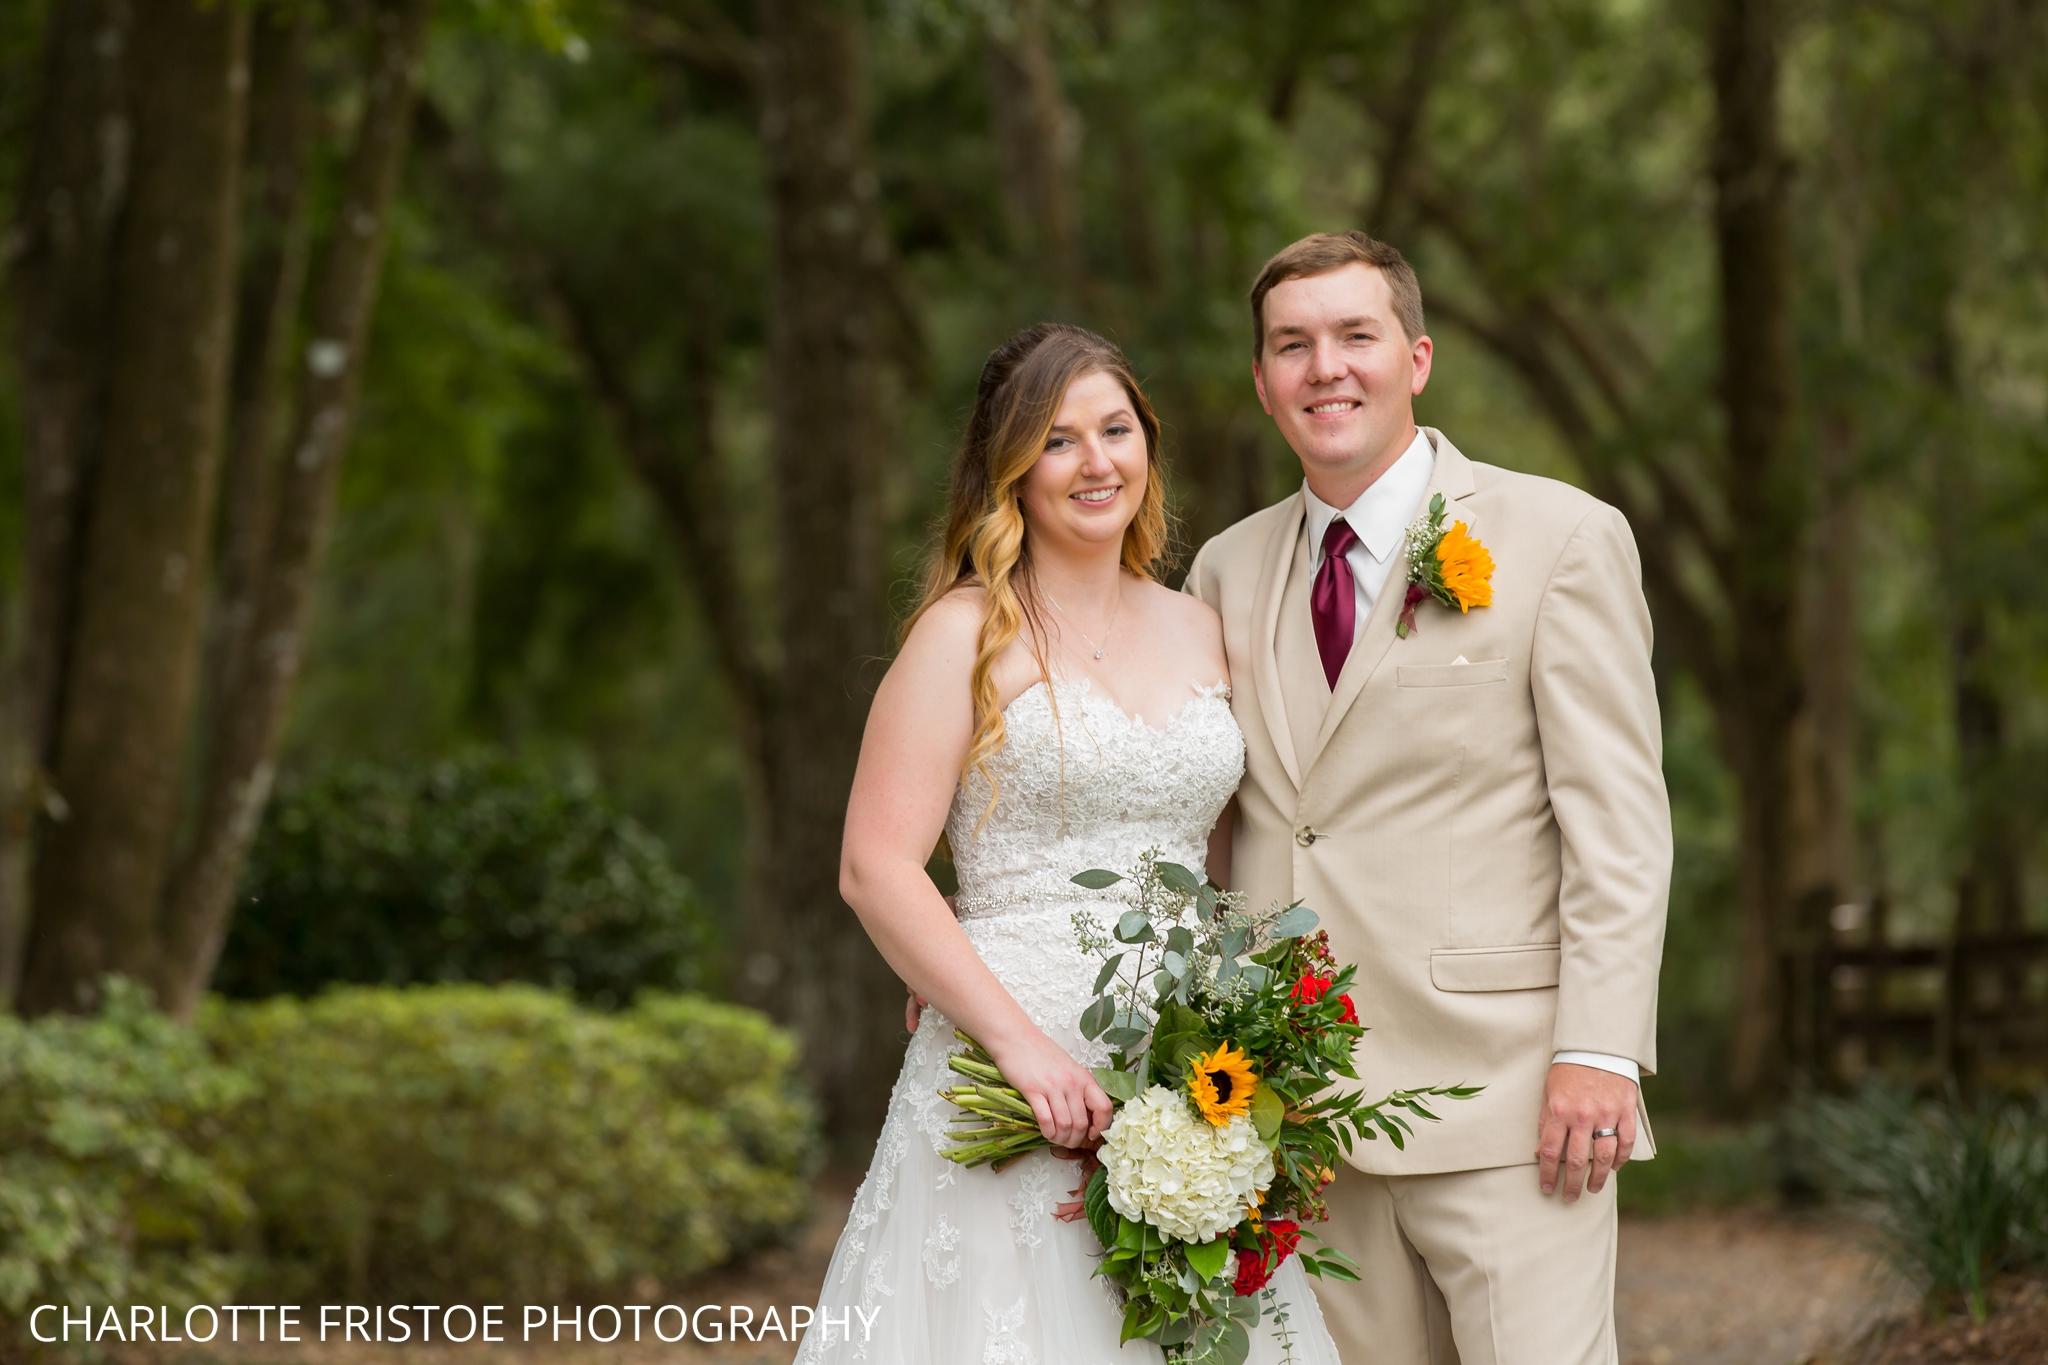 Tallahassee_Wedding_Charlotte_Fristoe-52.jpg